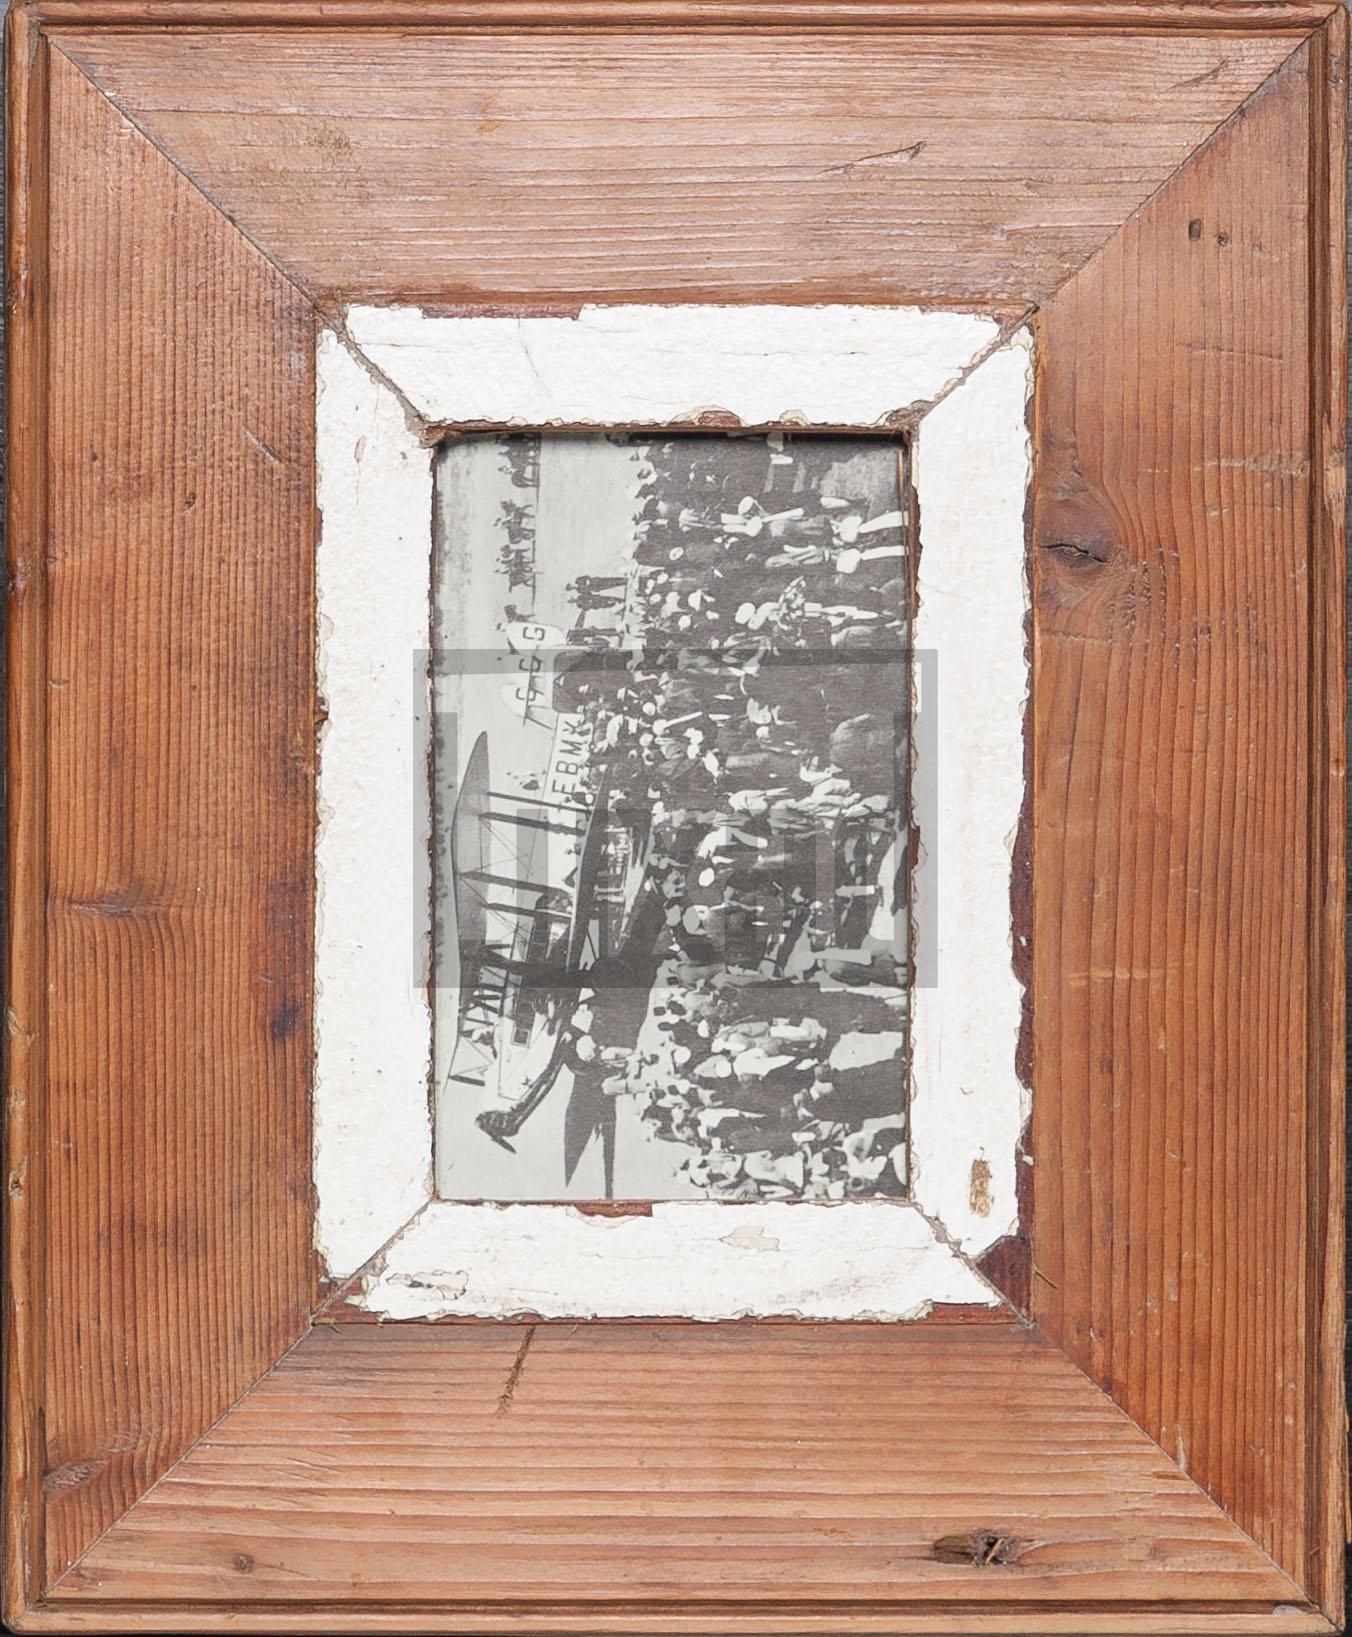 Holzbilderrahmen für Fotos DIN A6